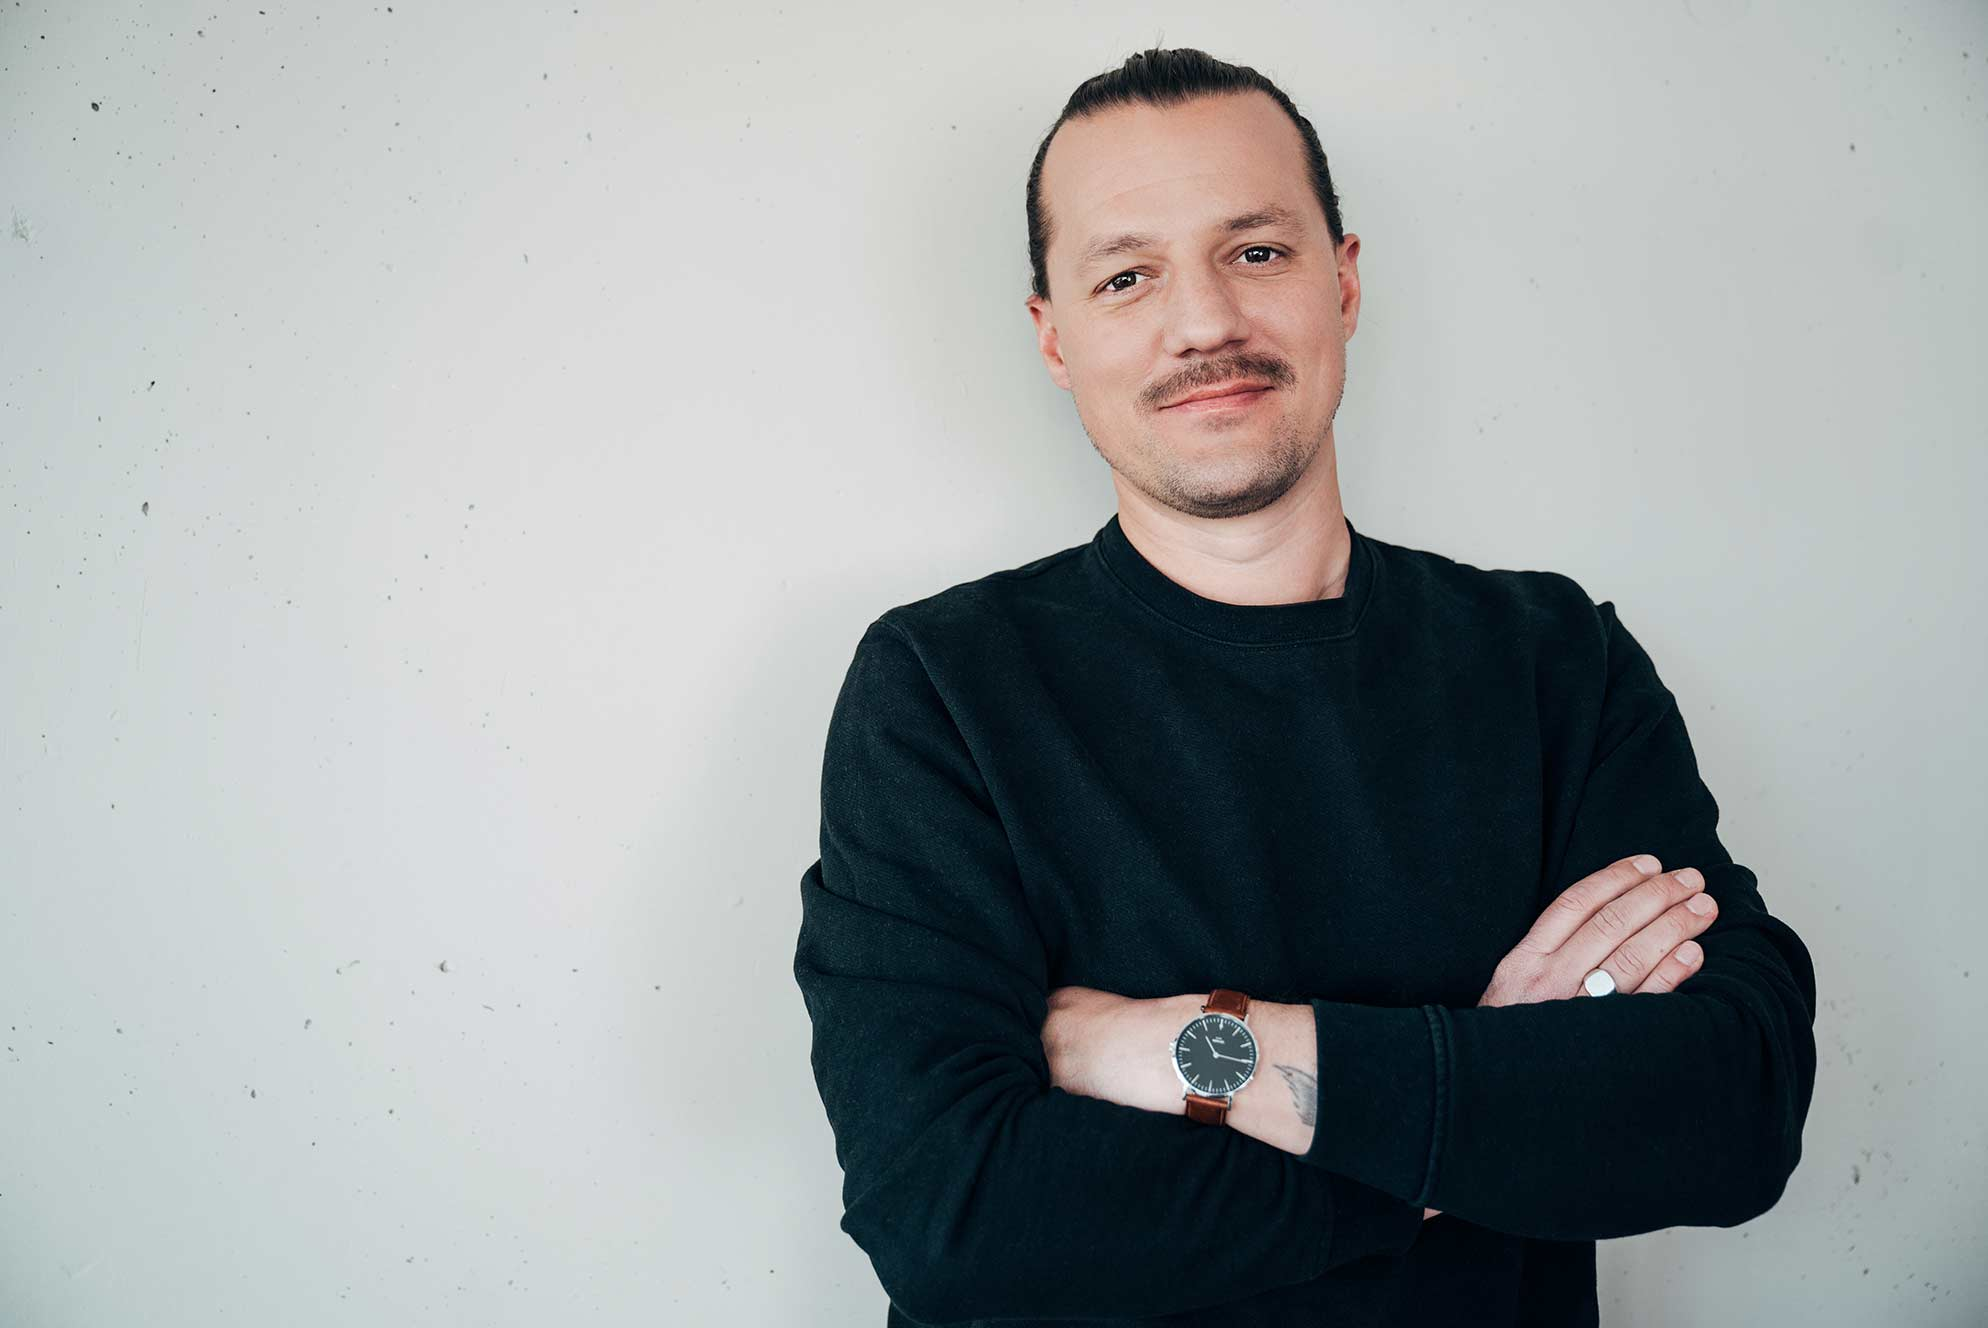 <b>Christian Mack</b><br/> Creative Director